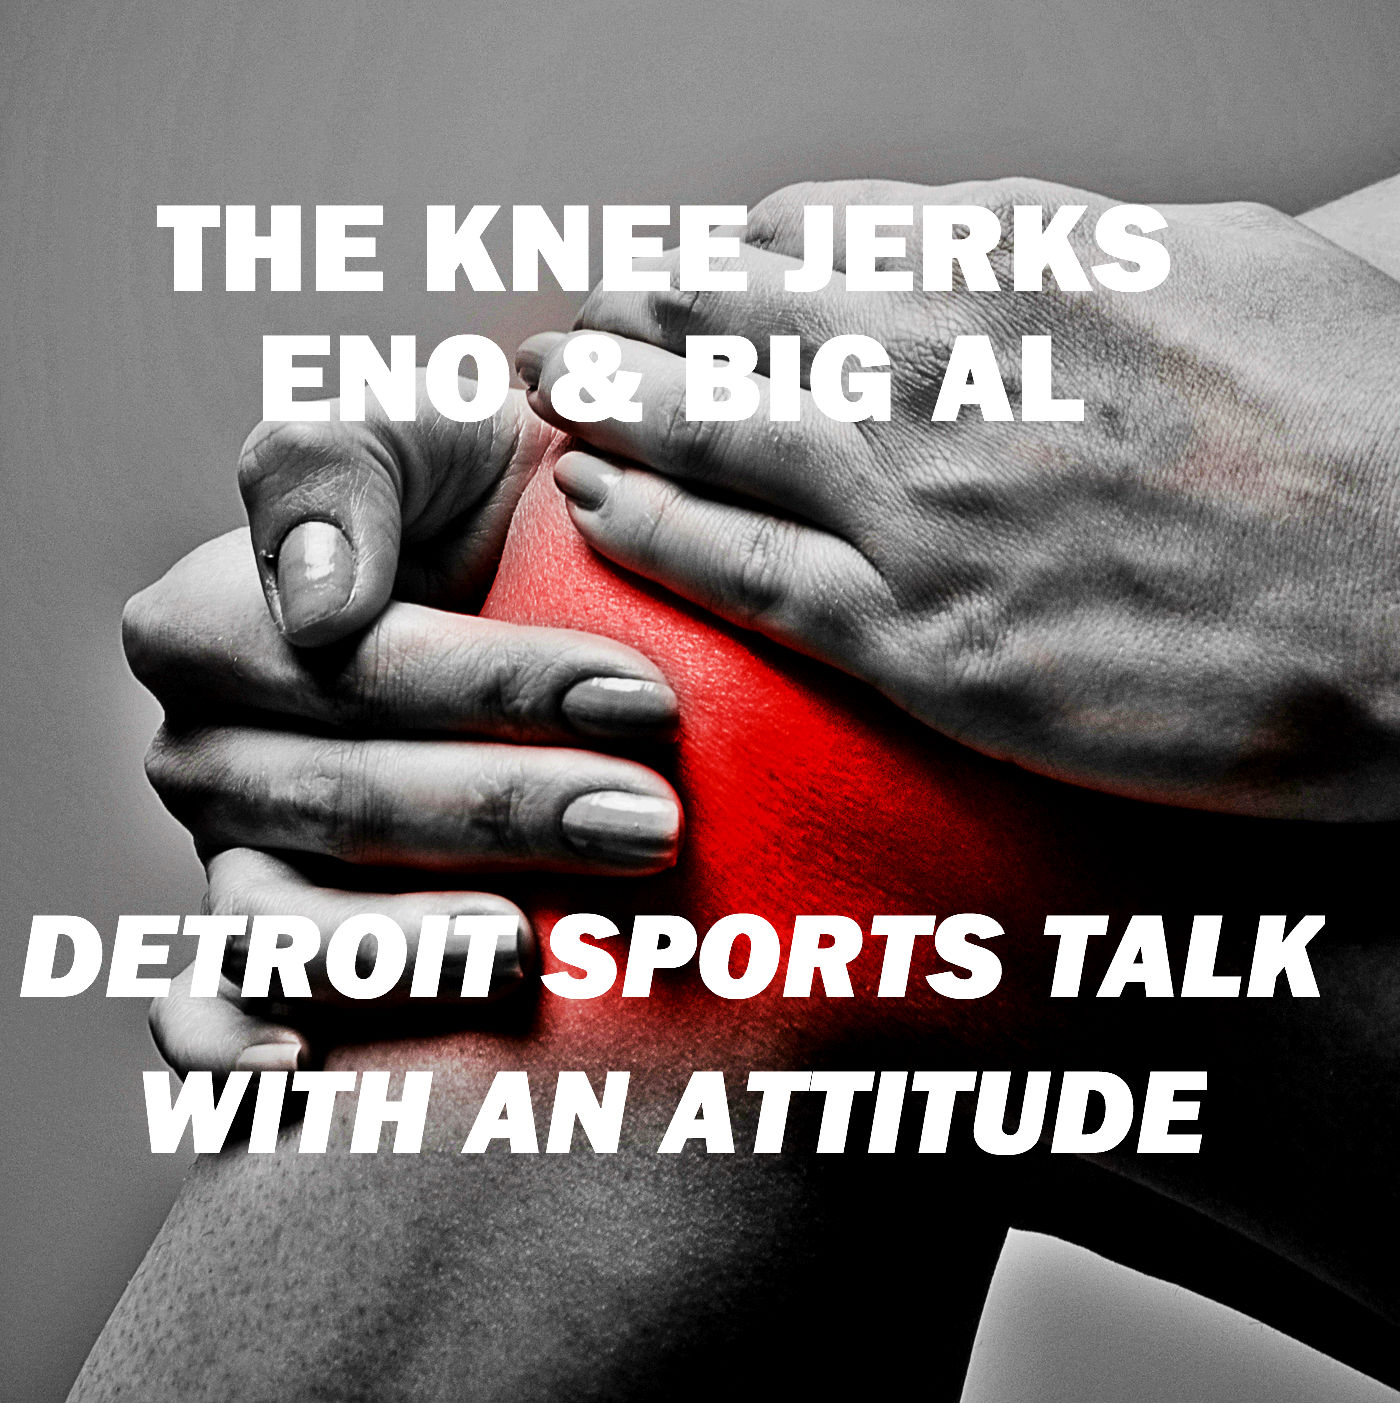 The Knee Jerks - Eno and Big Al show art